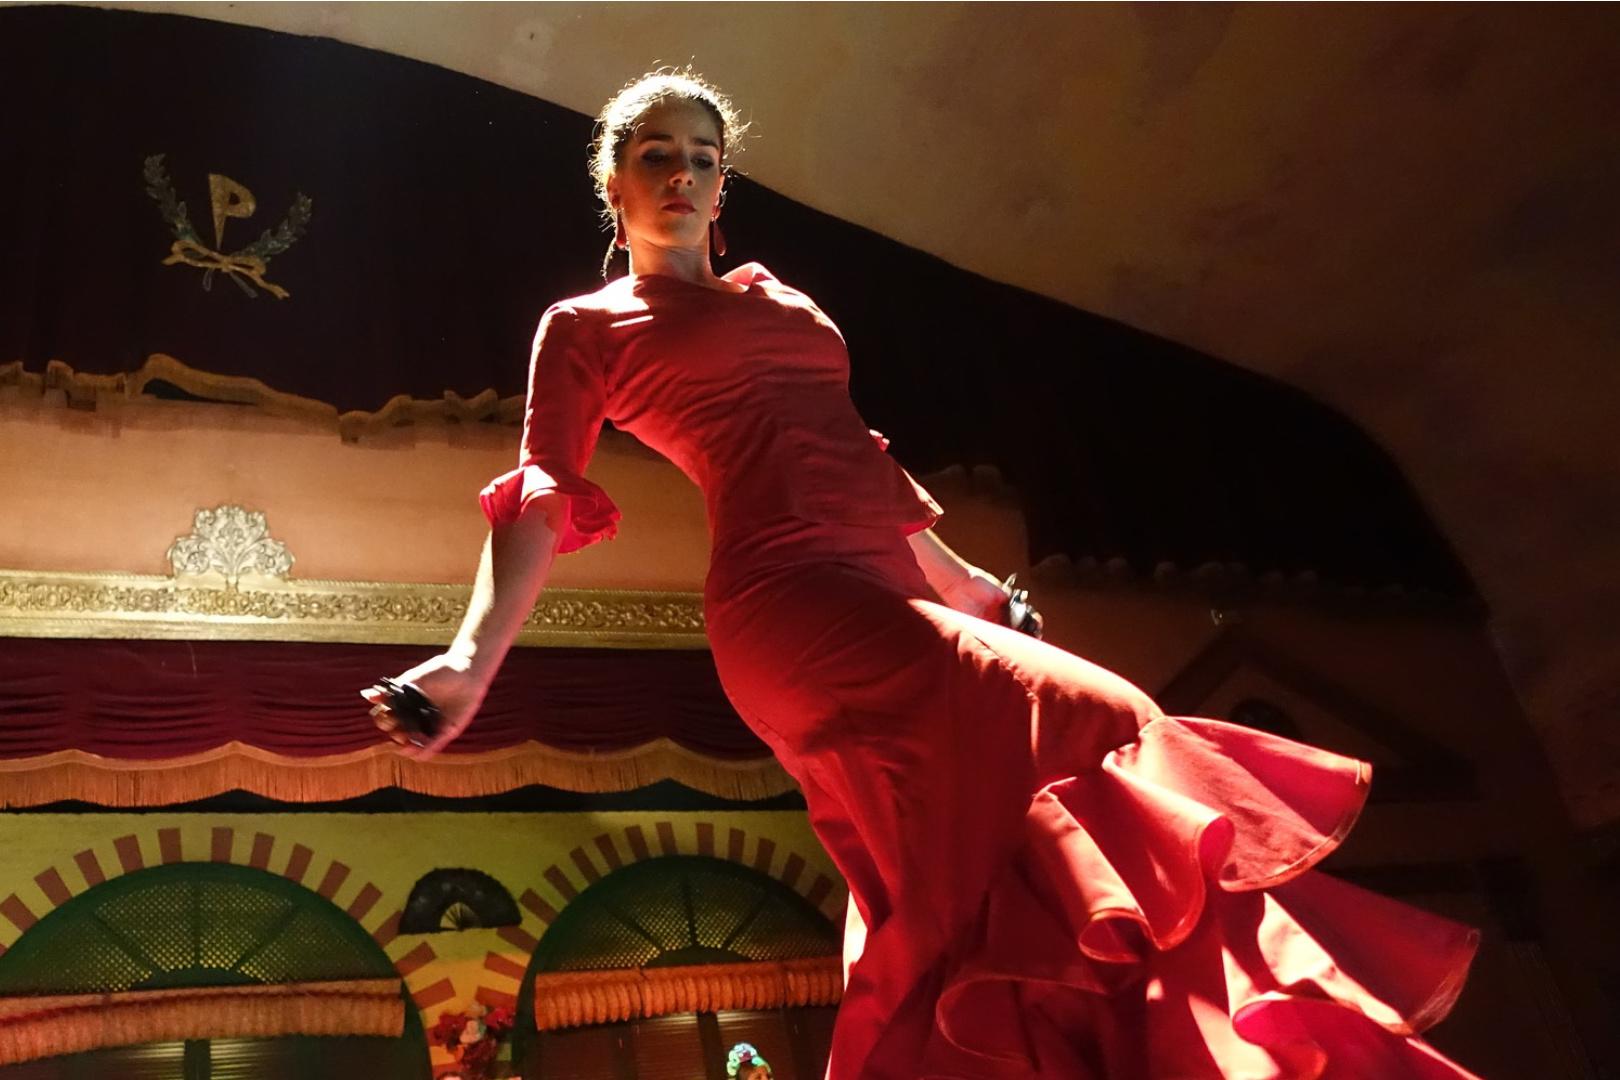 The Intense Passion of Flamenco